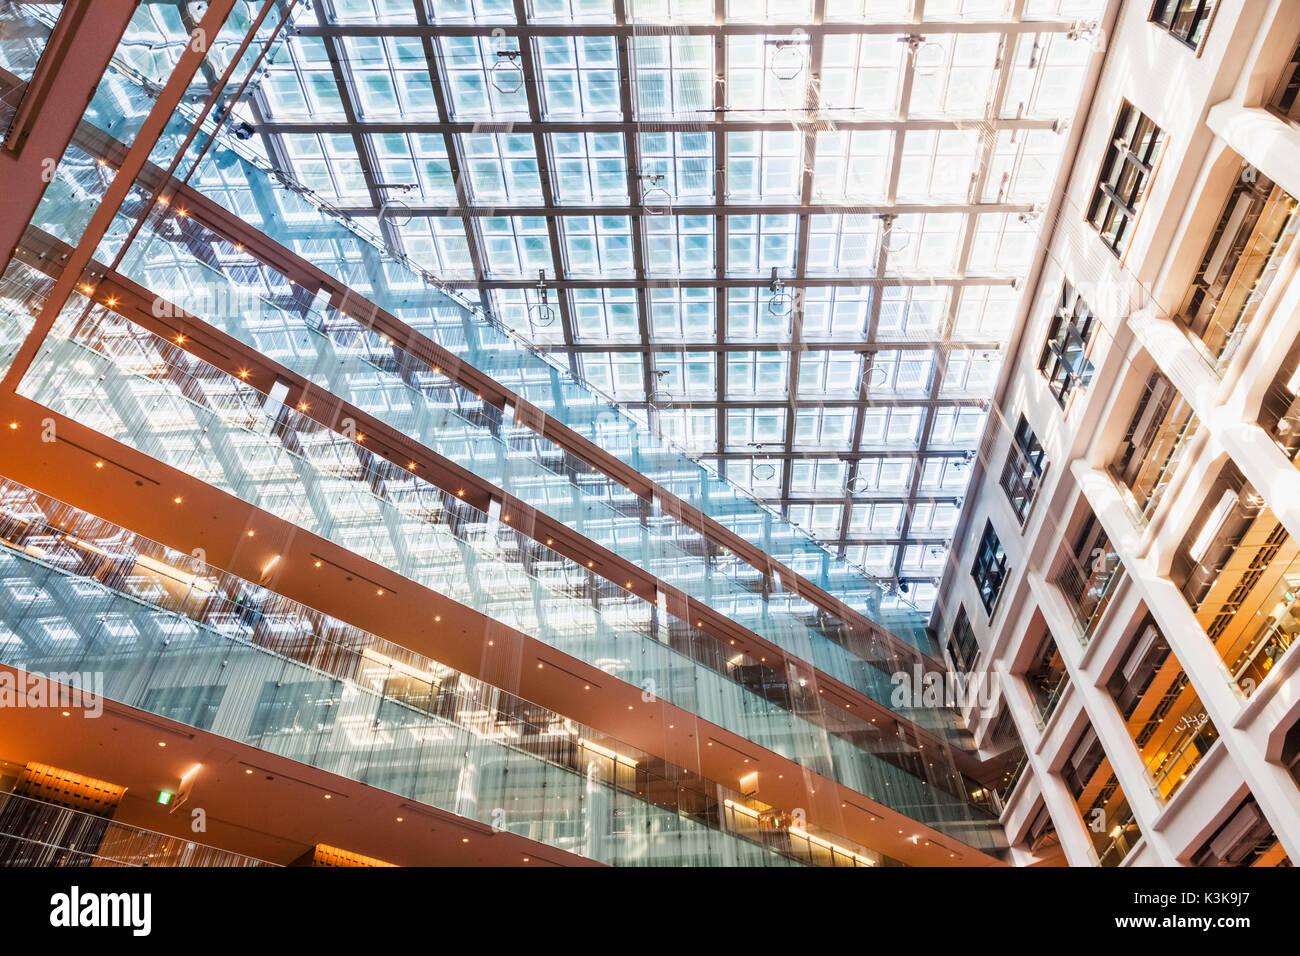 Japan, Hoshu, Tokyo, Marunouchi, Kitte Building aka JP Tower Stock Photo